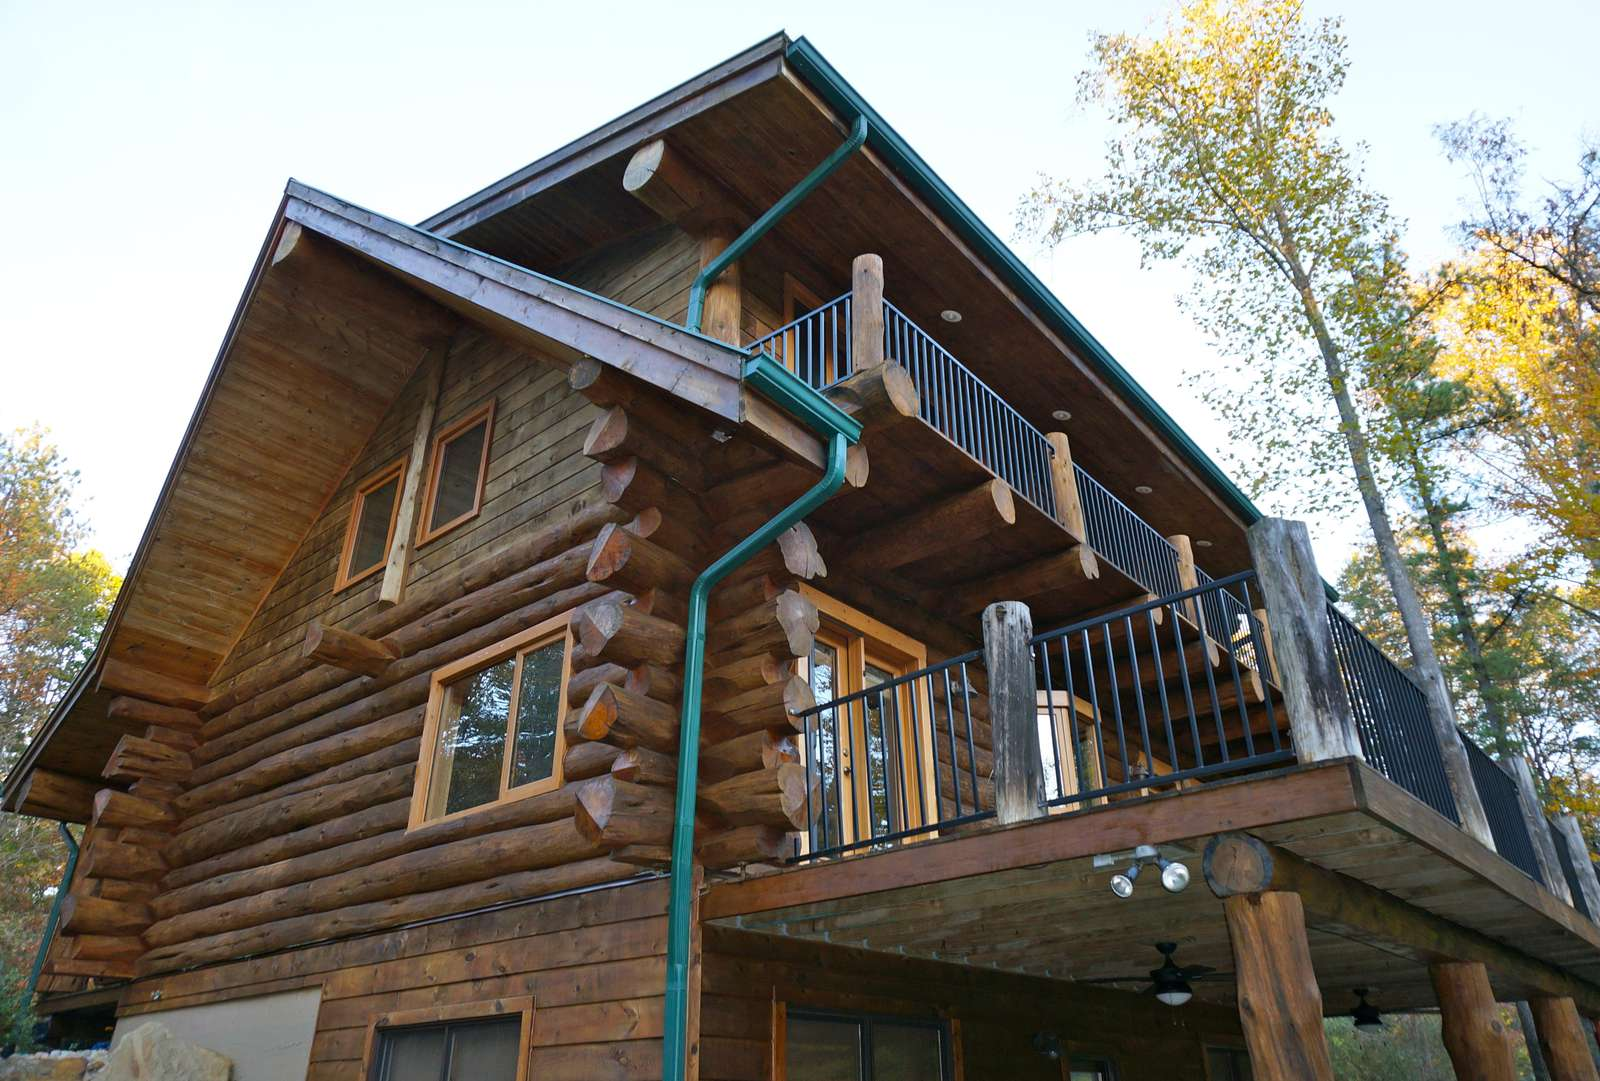 Drift Away Log Cabin - property